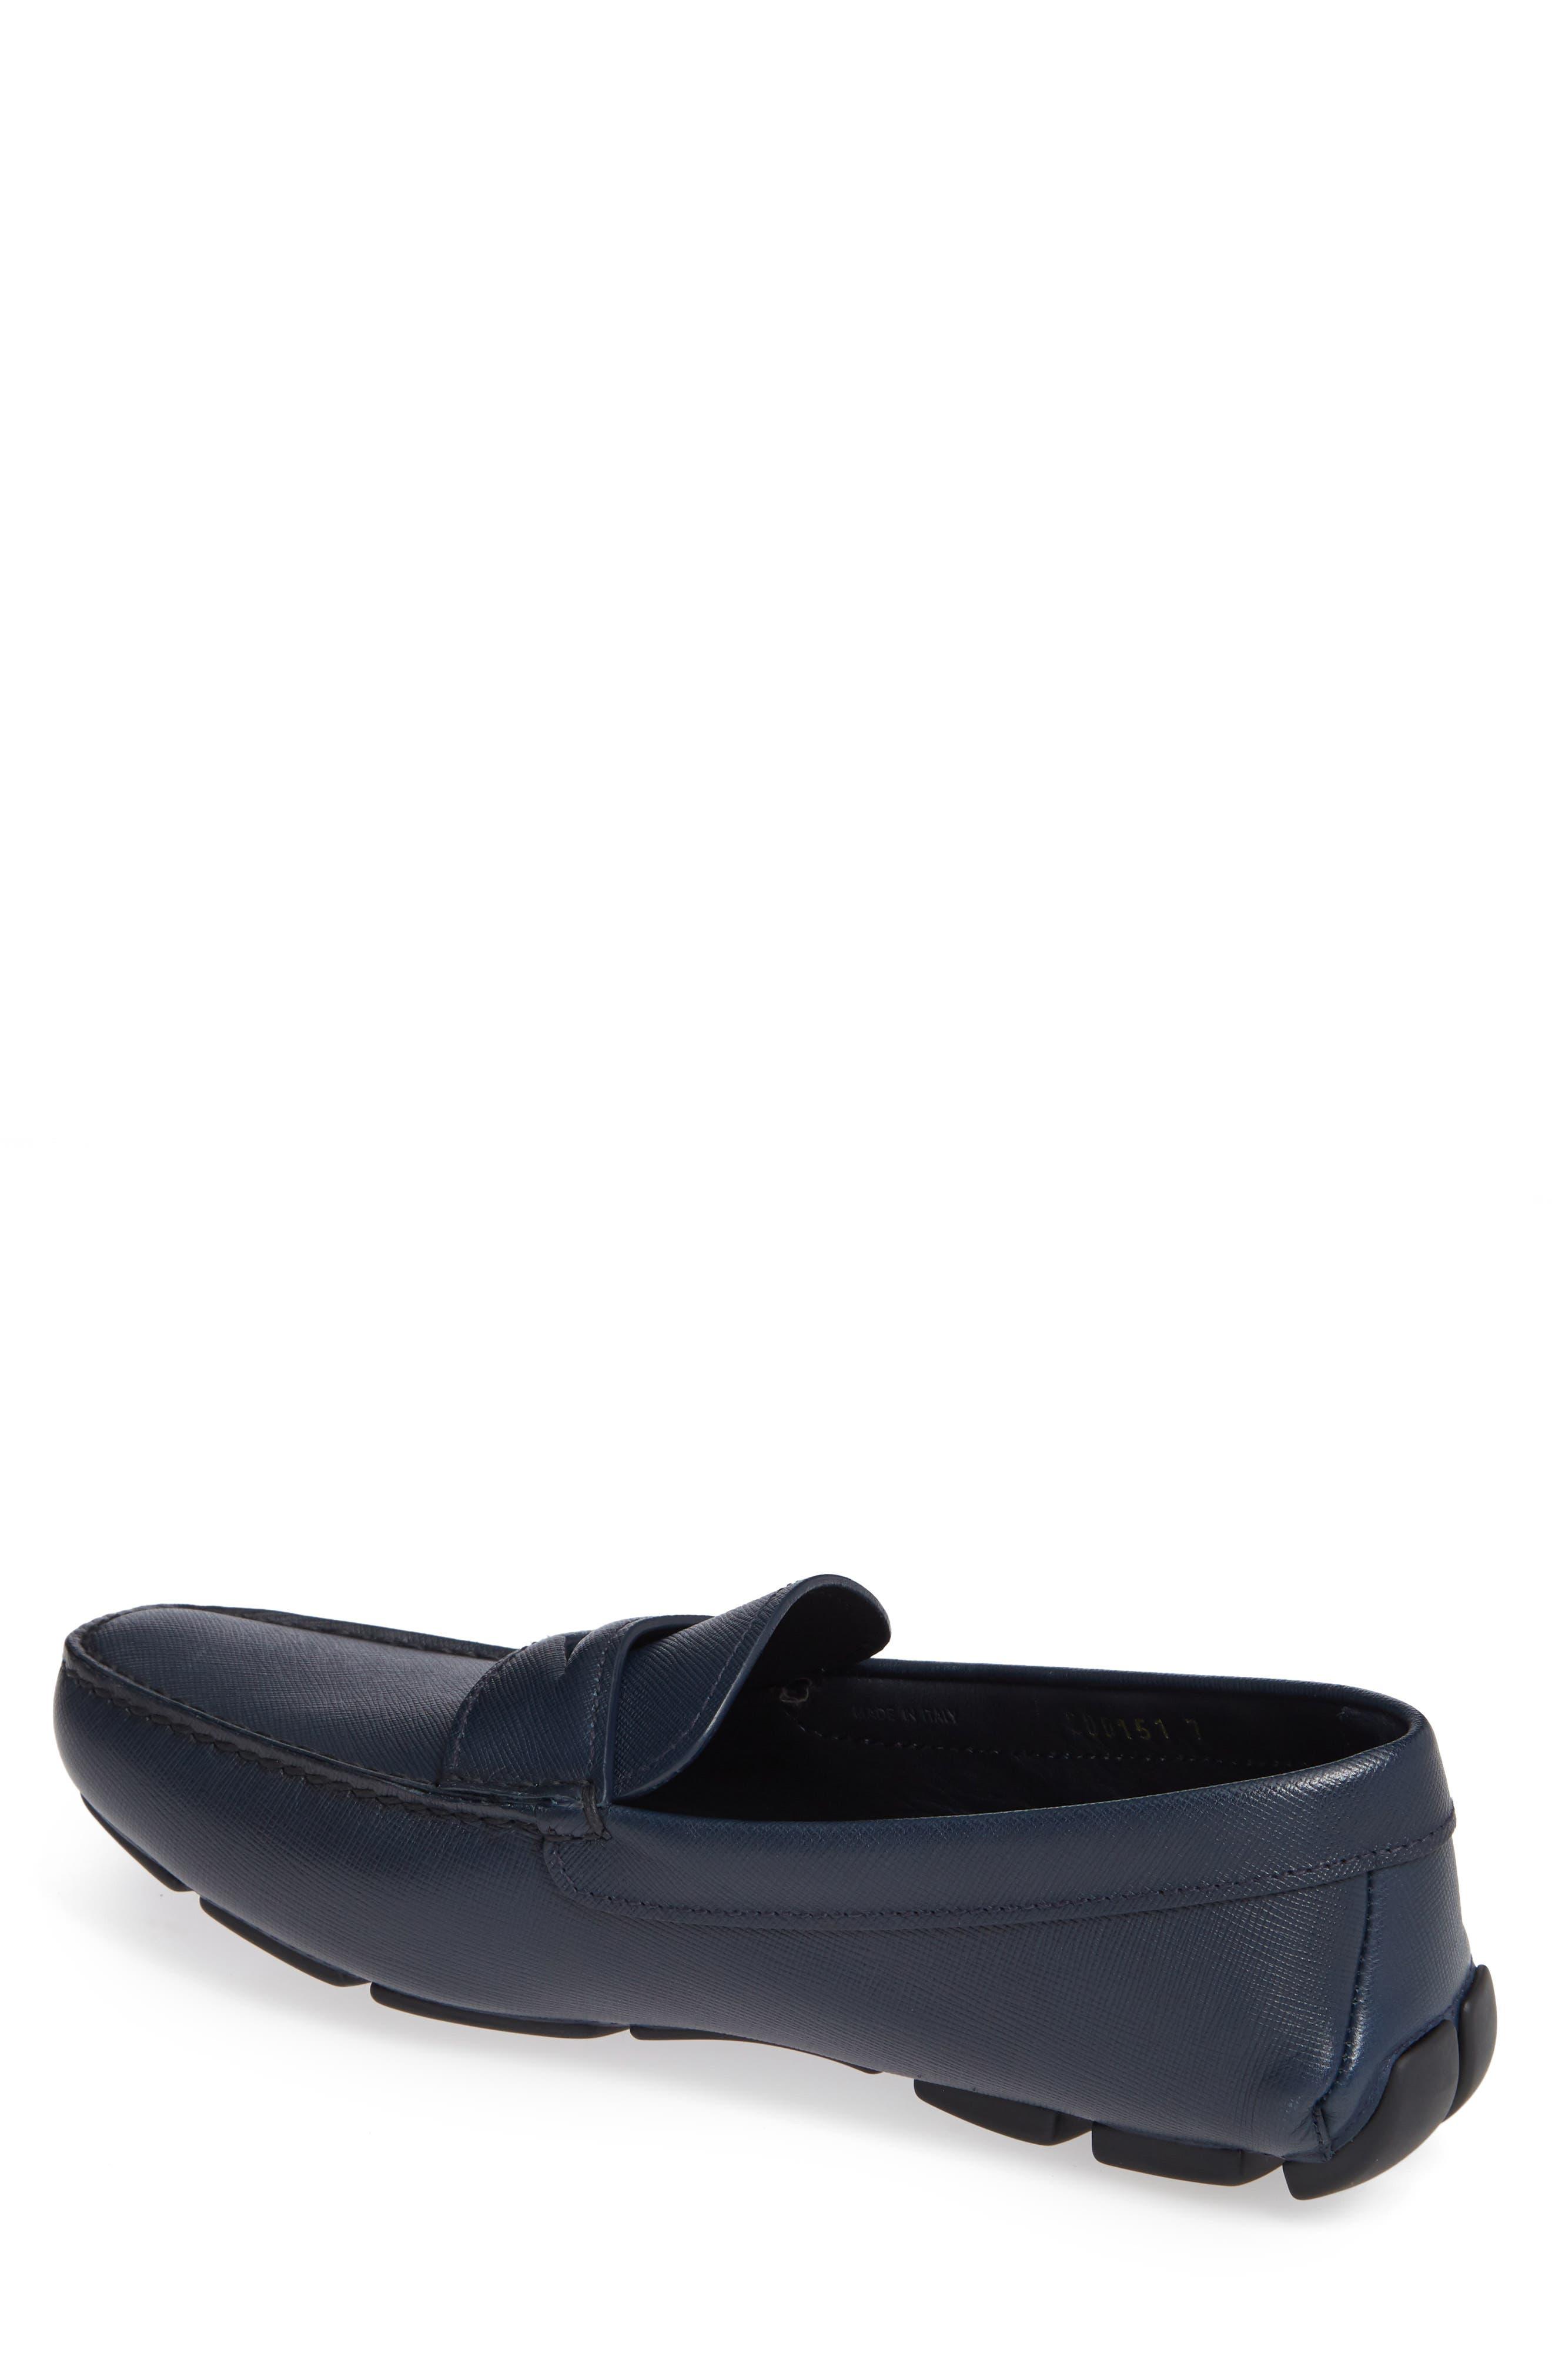 c7e71f38c88 Prada Men s Loafers   Driving Shoes